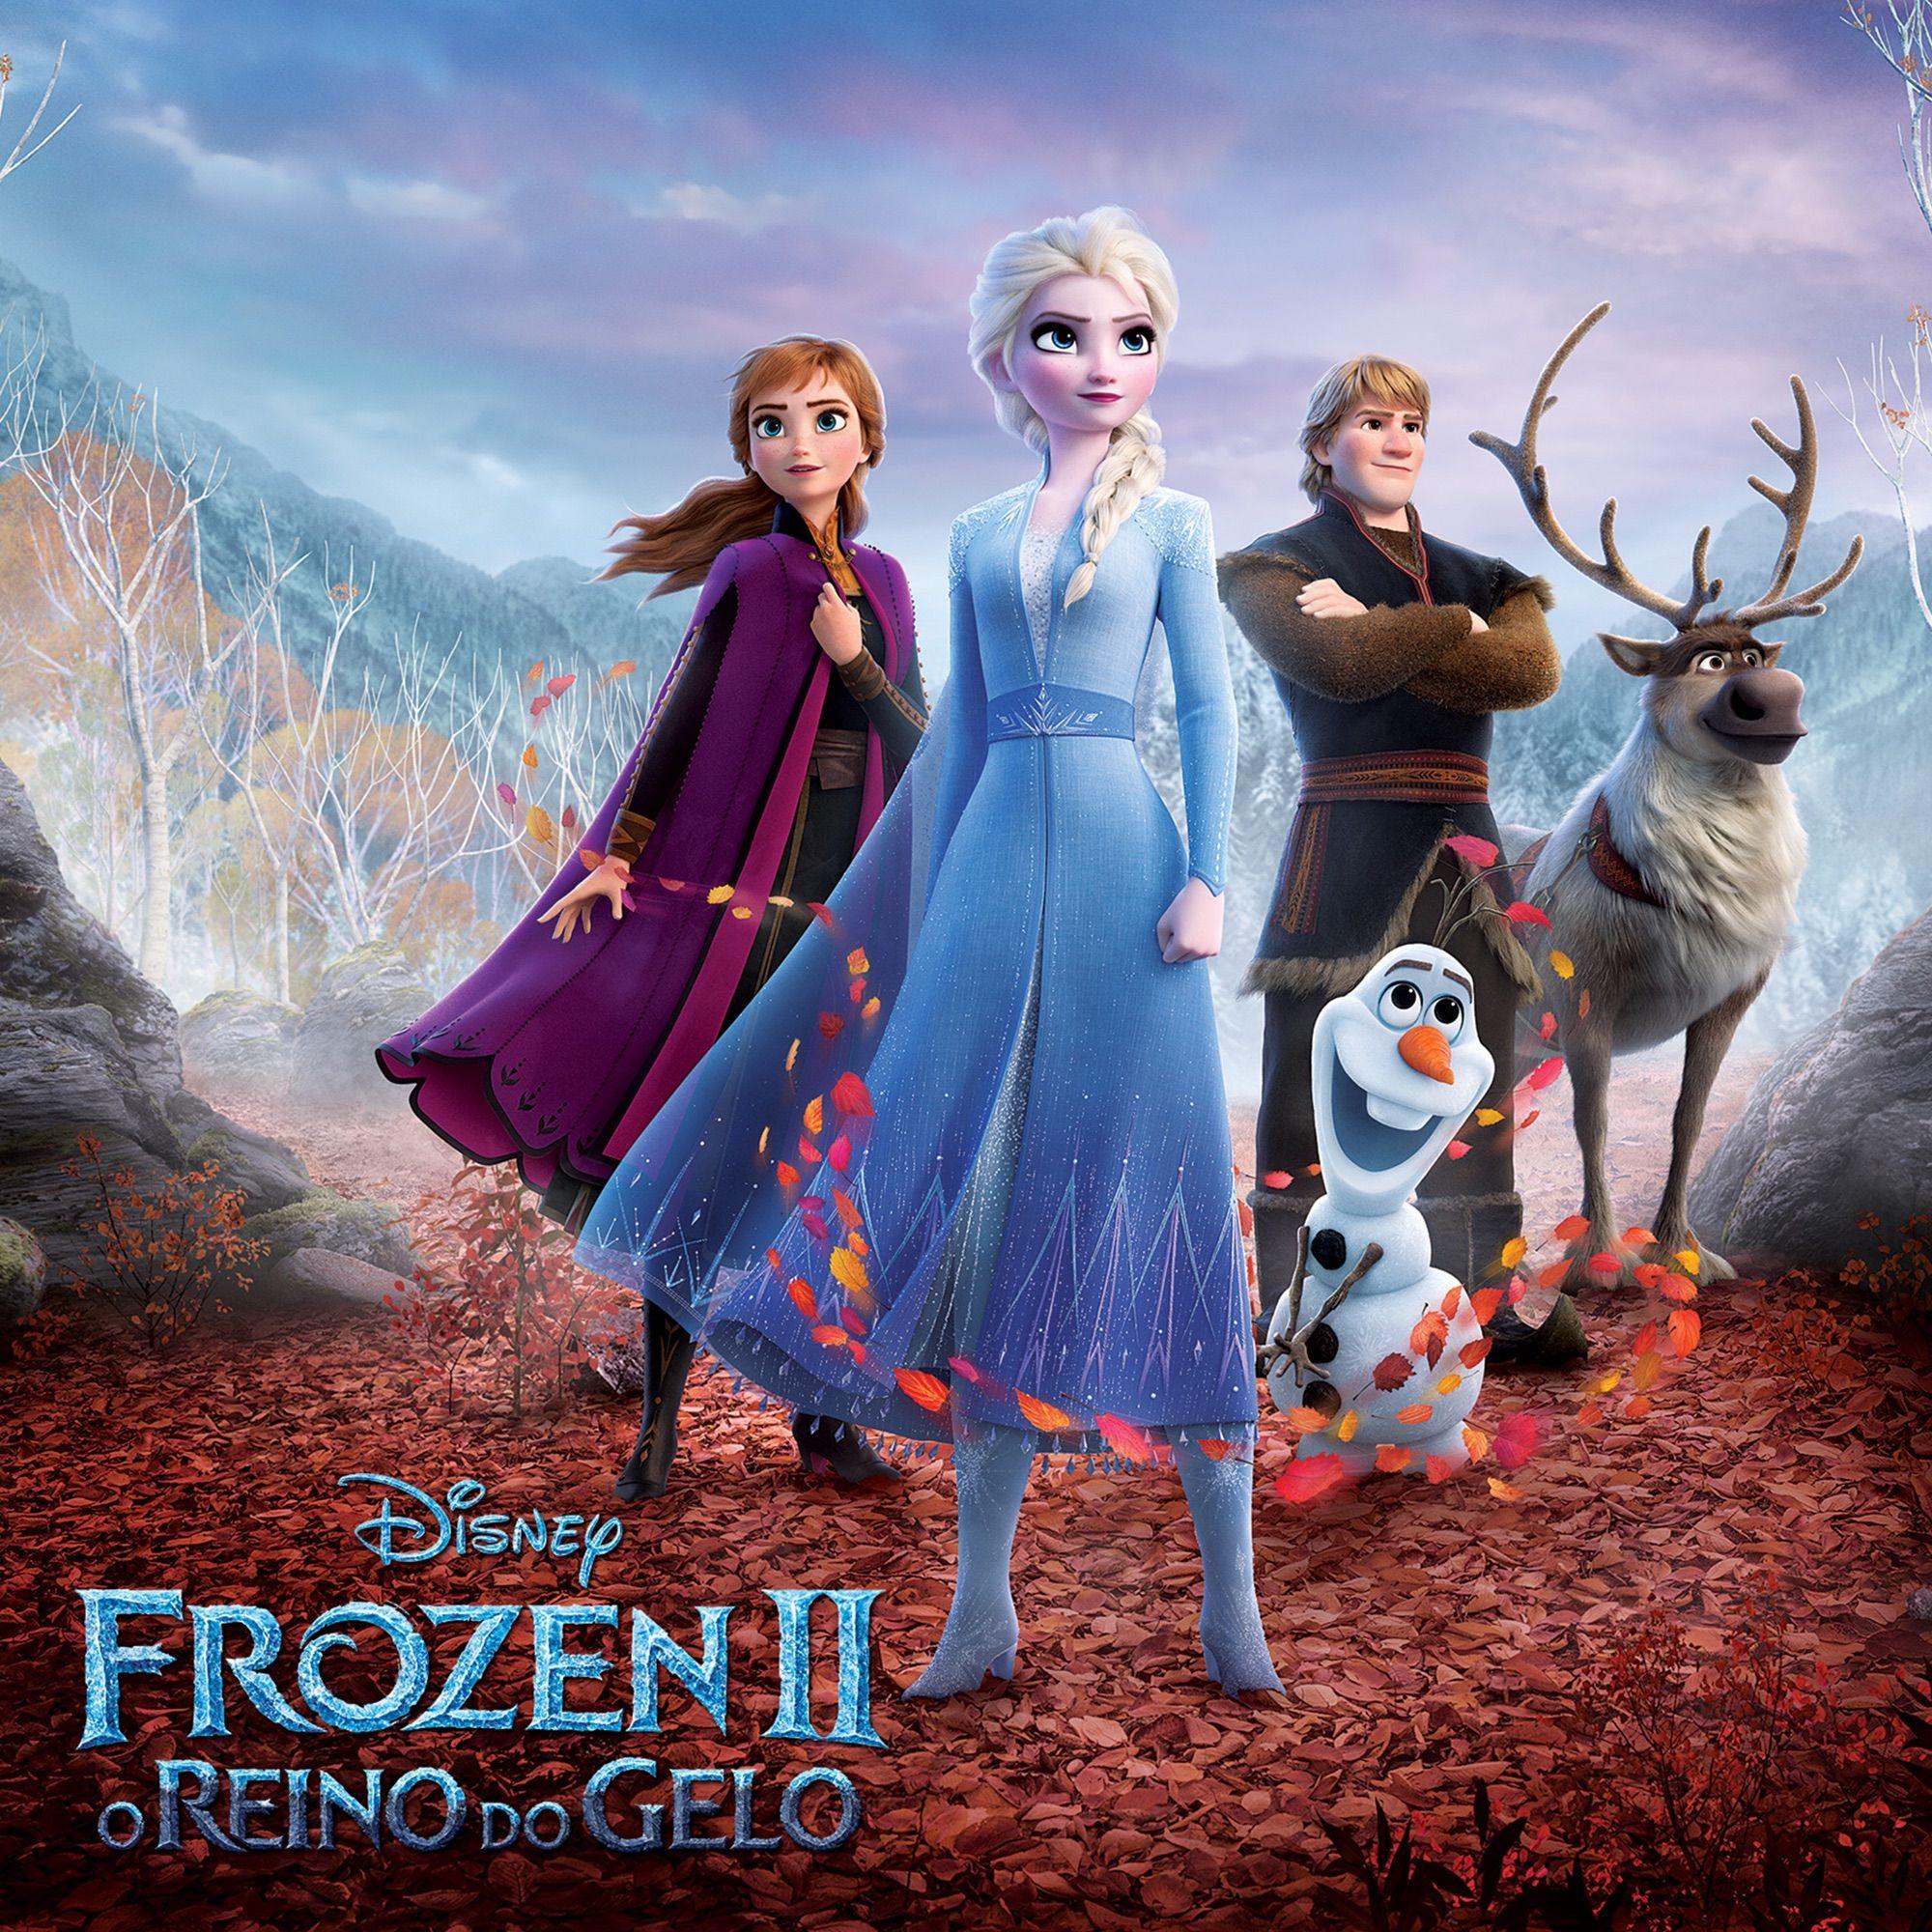 Voce Quer Brincar Na Neve Frozen Letra Da Musica Palco Mp3